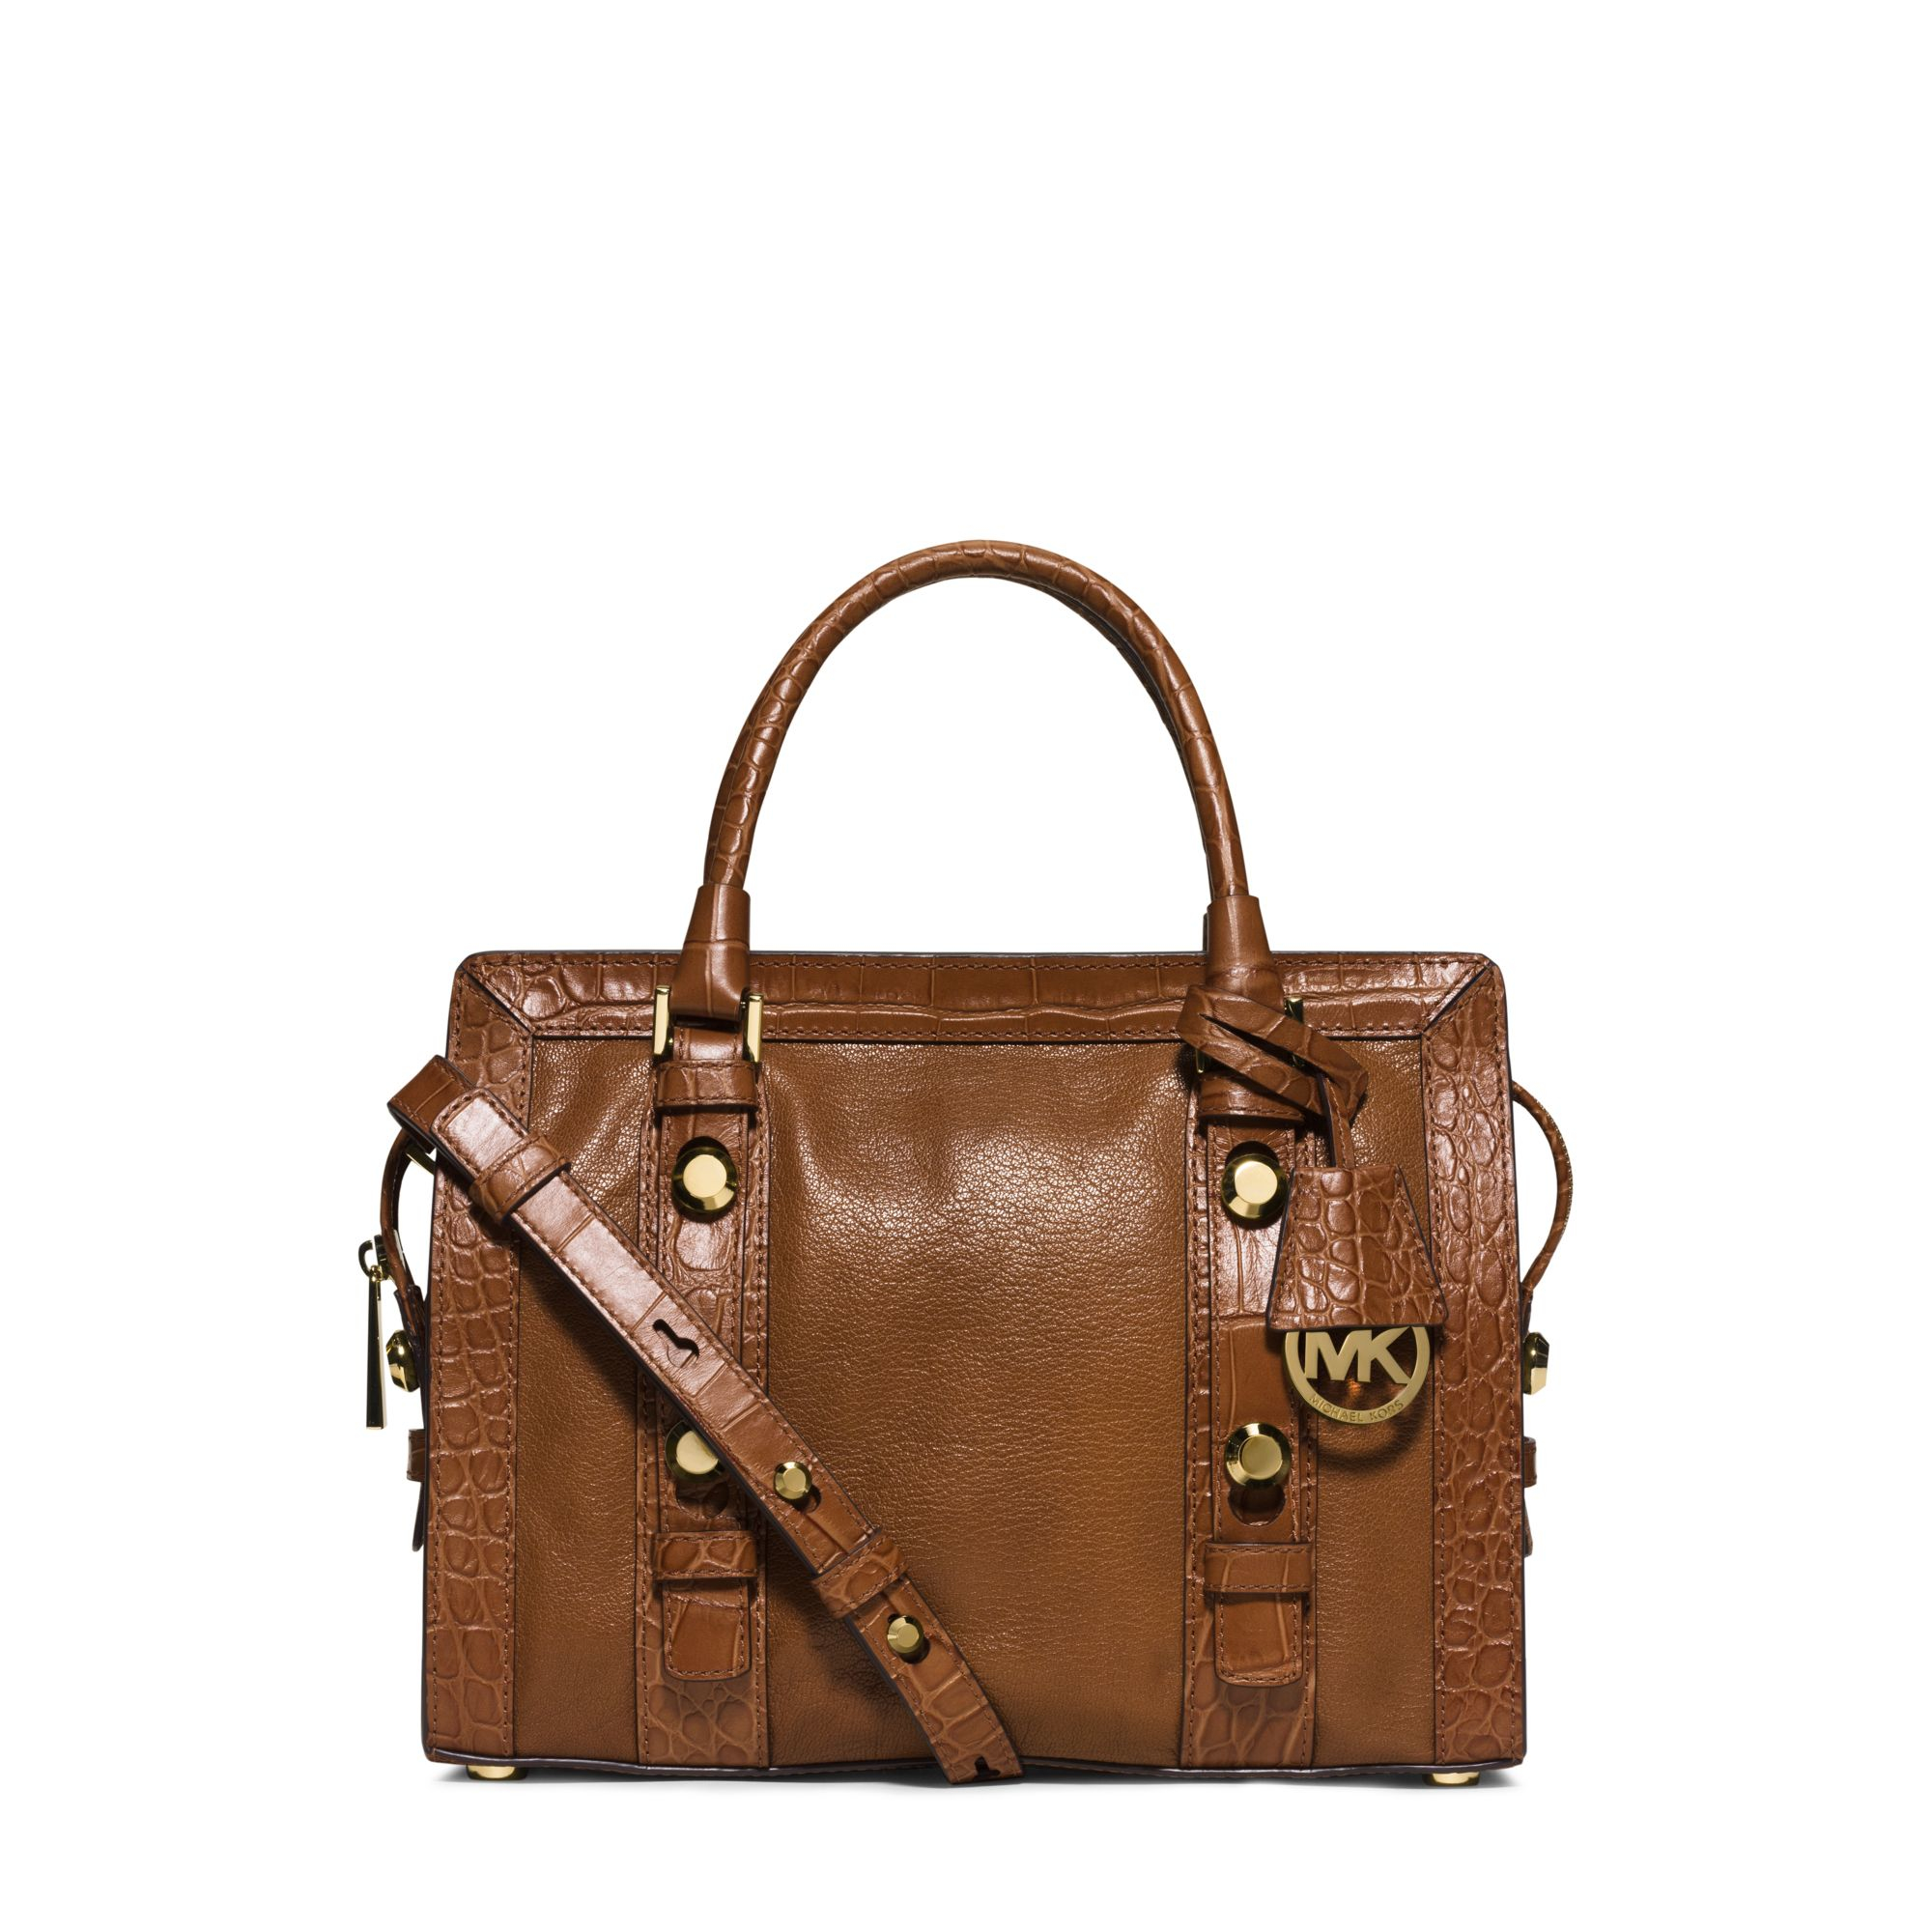 Key Fob App >> Michael kors Collins Stud Medium Leather Satchel in Brown | Lyst